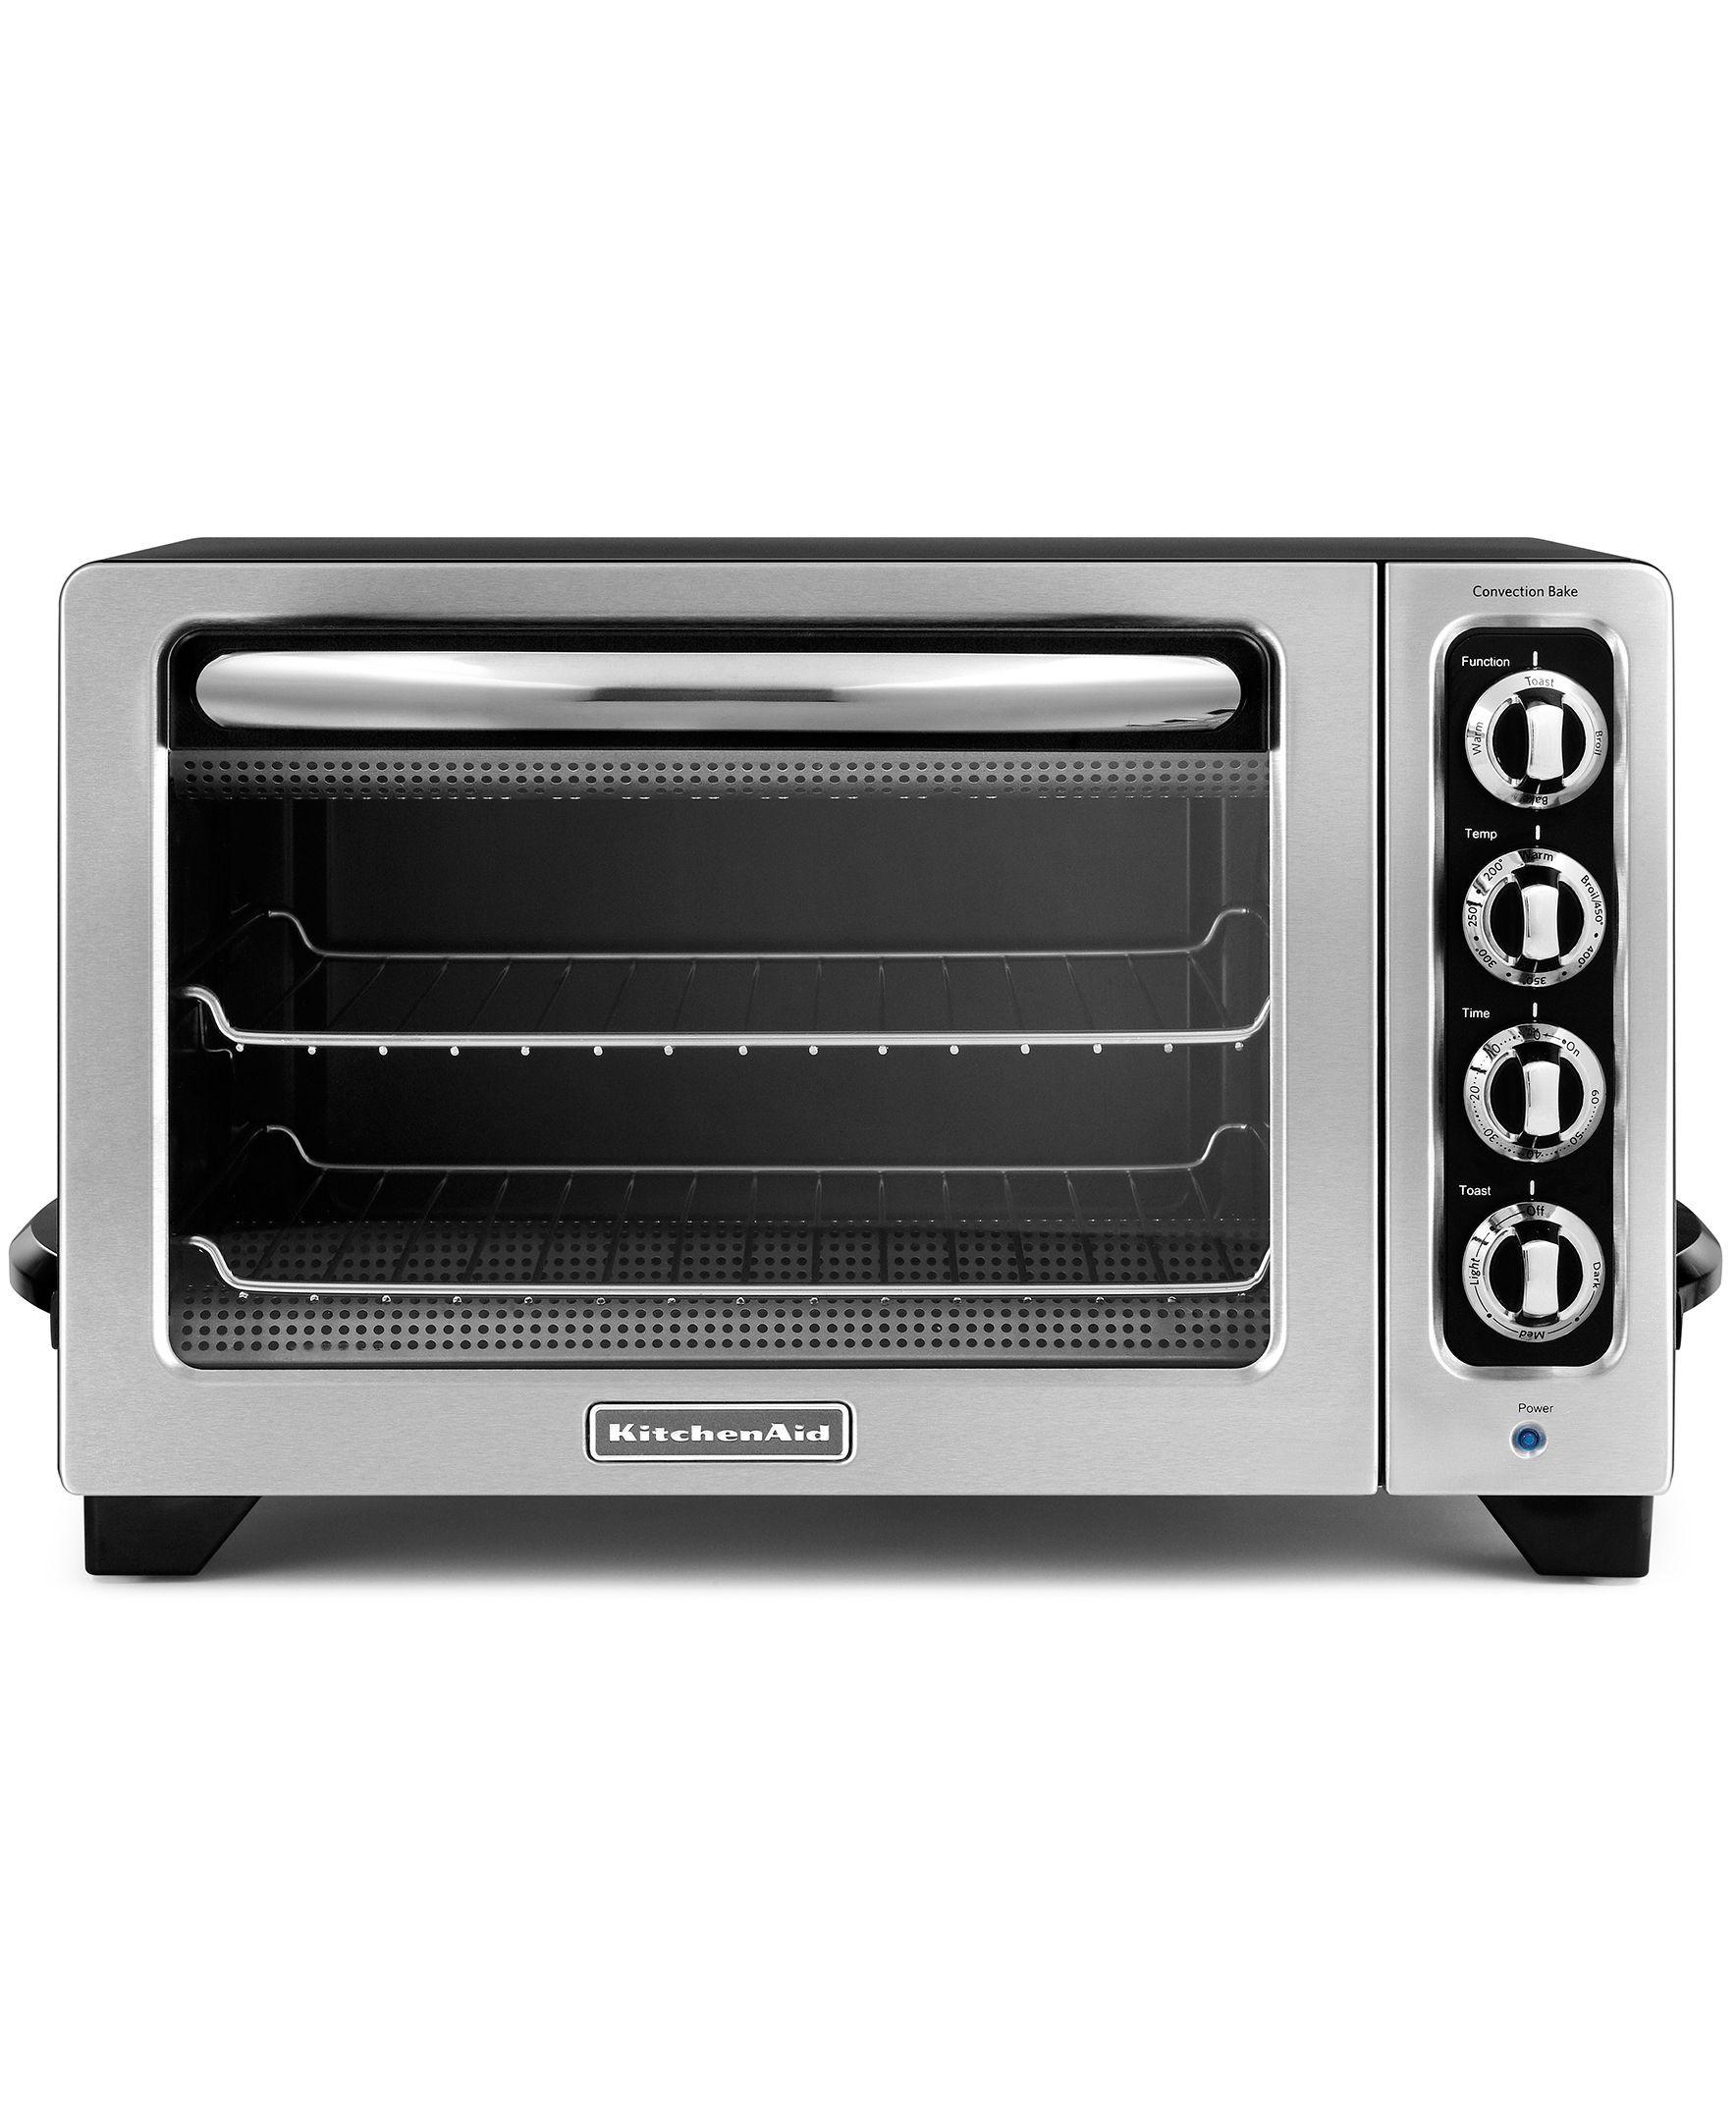 Kitchenaid Kco222ob Countertop Toaster Oven Countertop Toaster